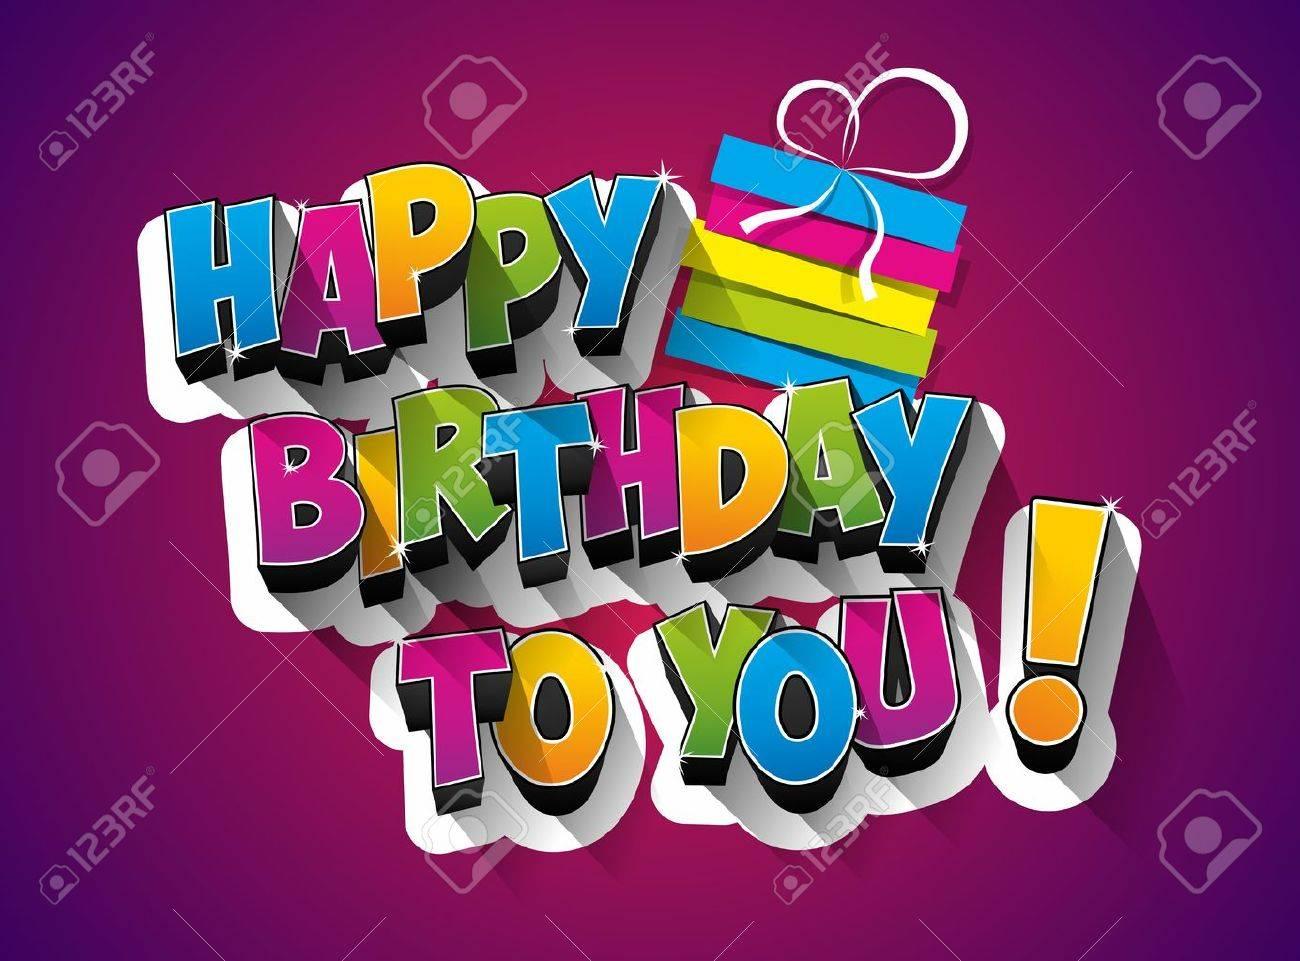 Happy Birthday celebration greeting card illustration - 48552472